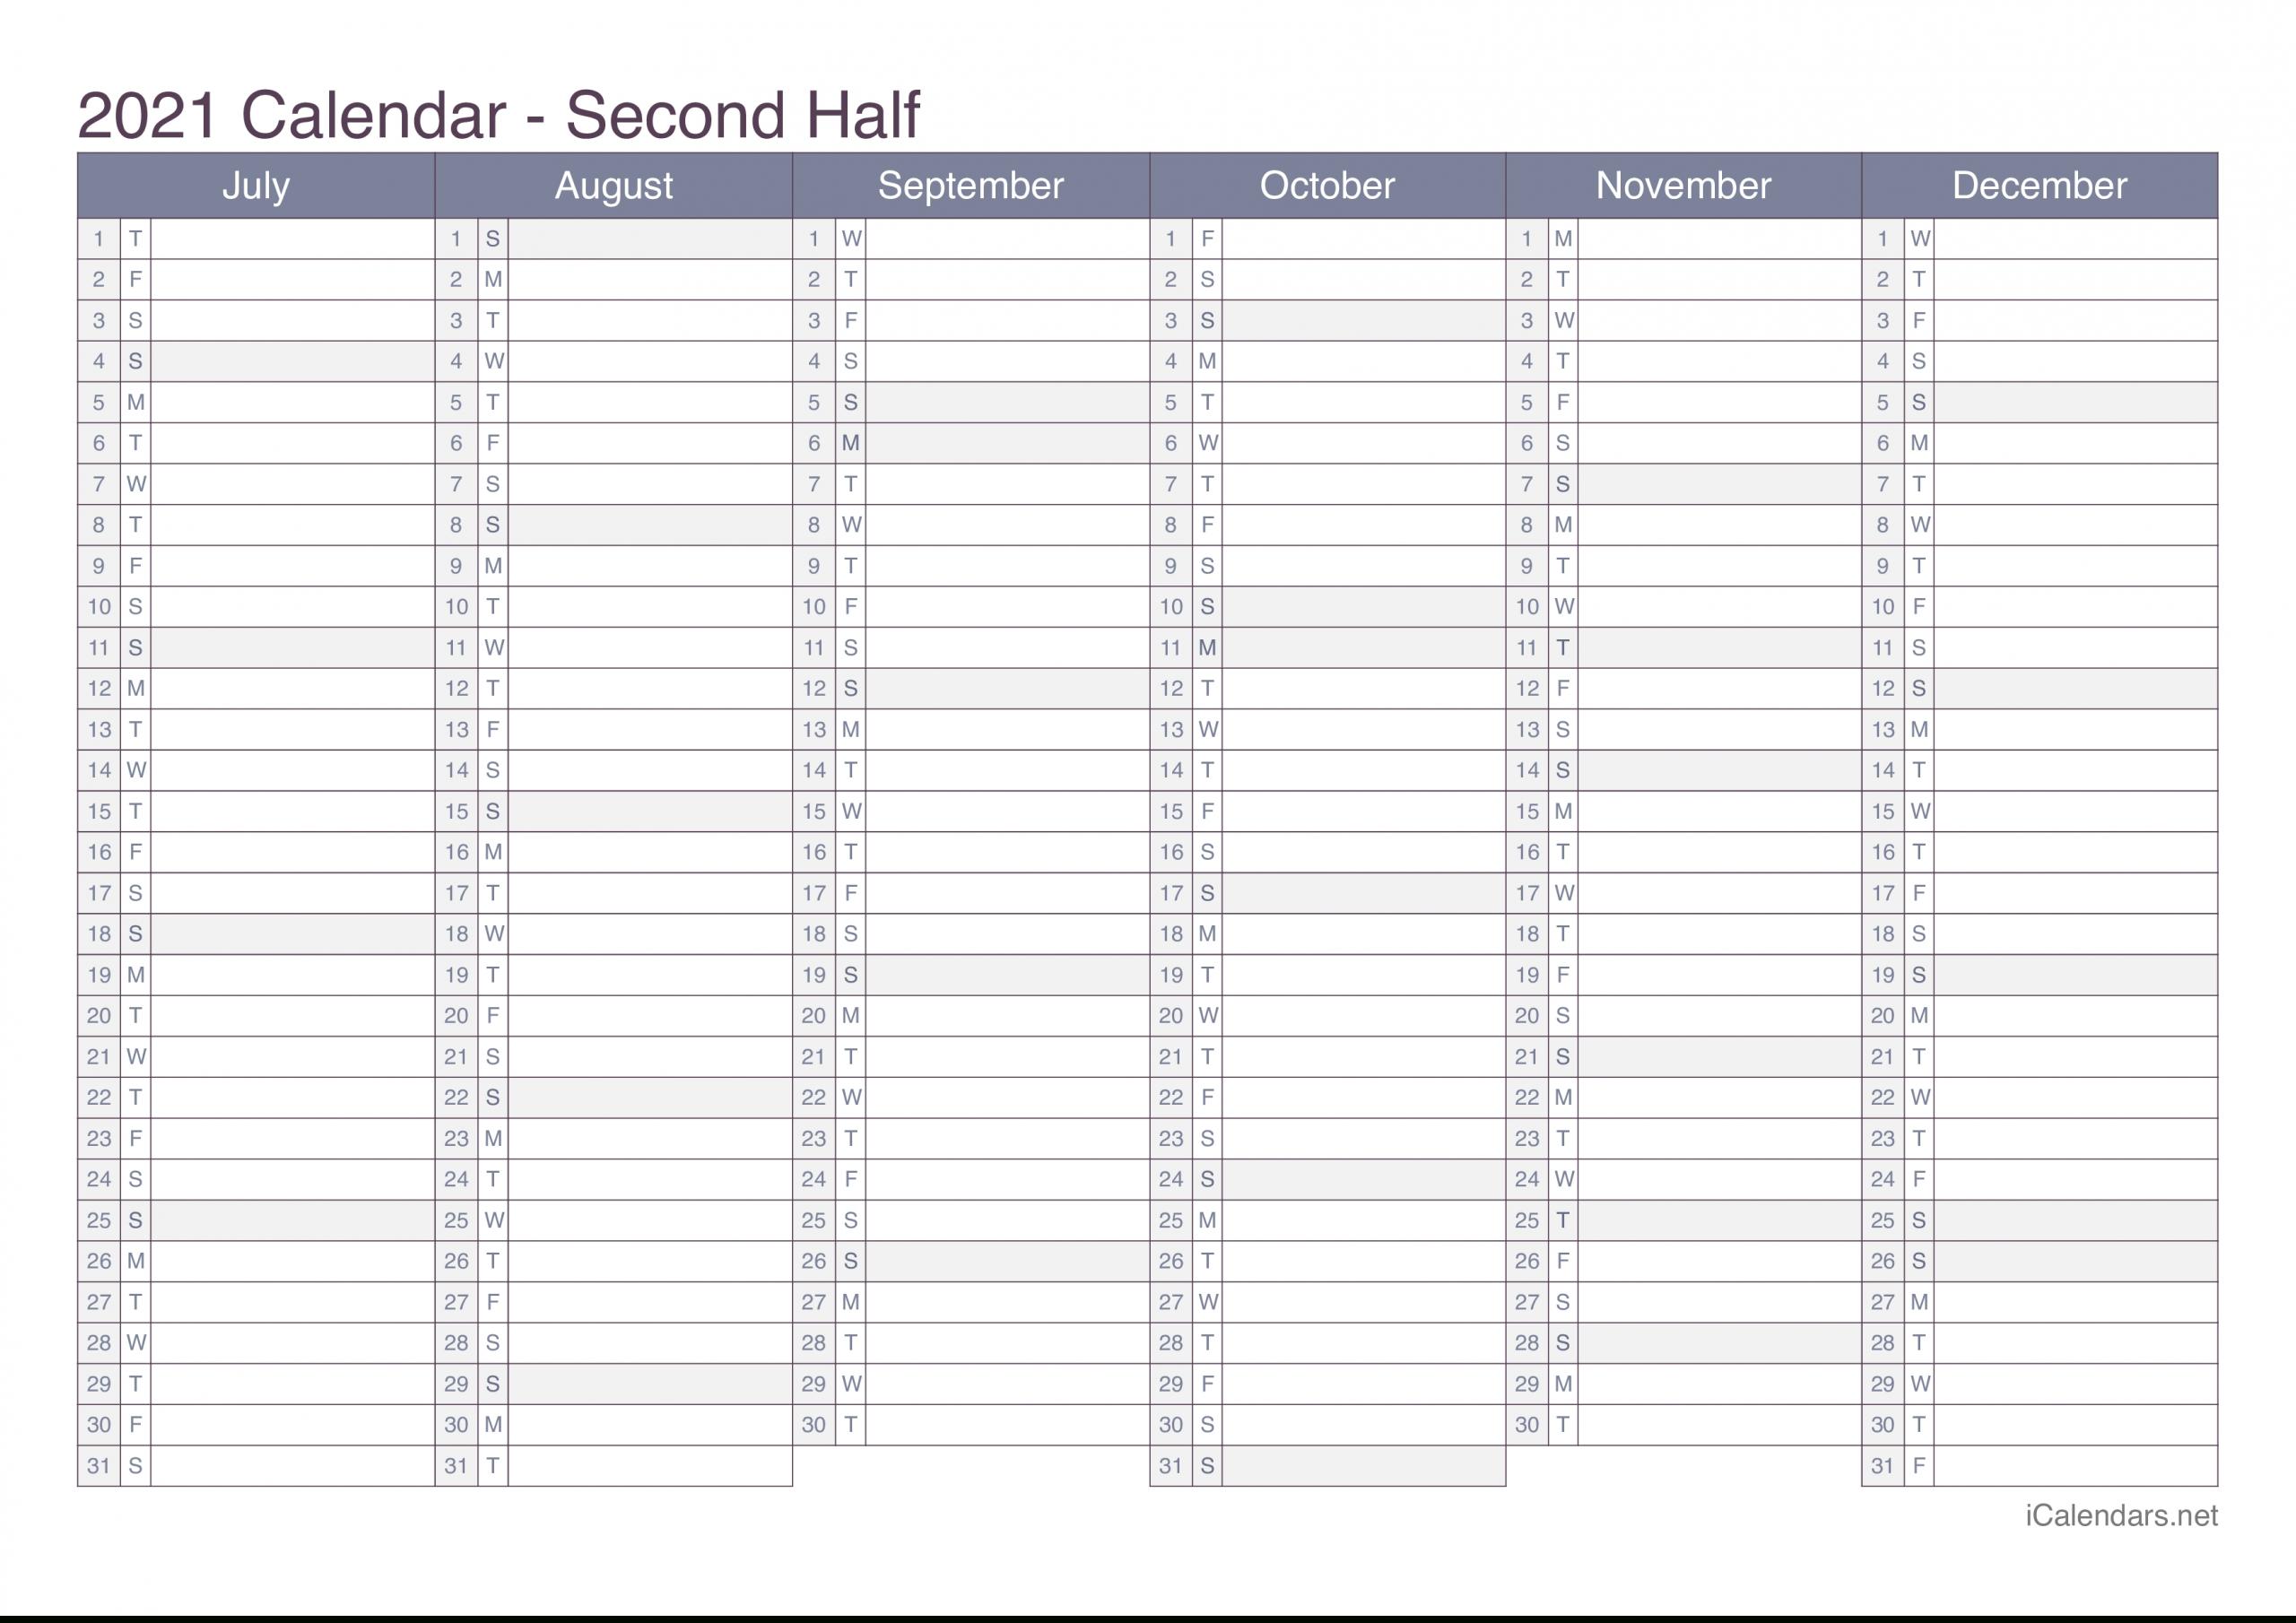 2021 Printable Calendar - Pdf Or Excel - Icalendars-2021 Year Calendar Printable